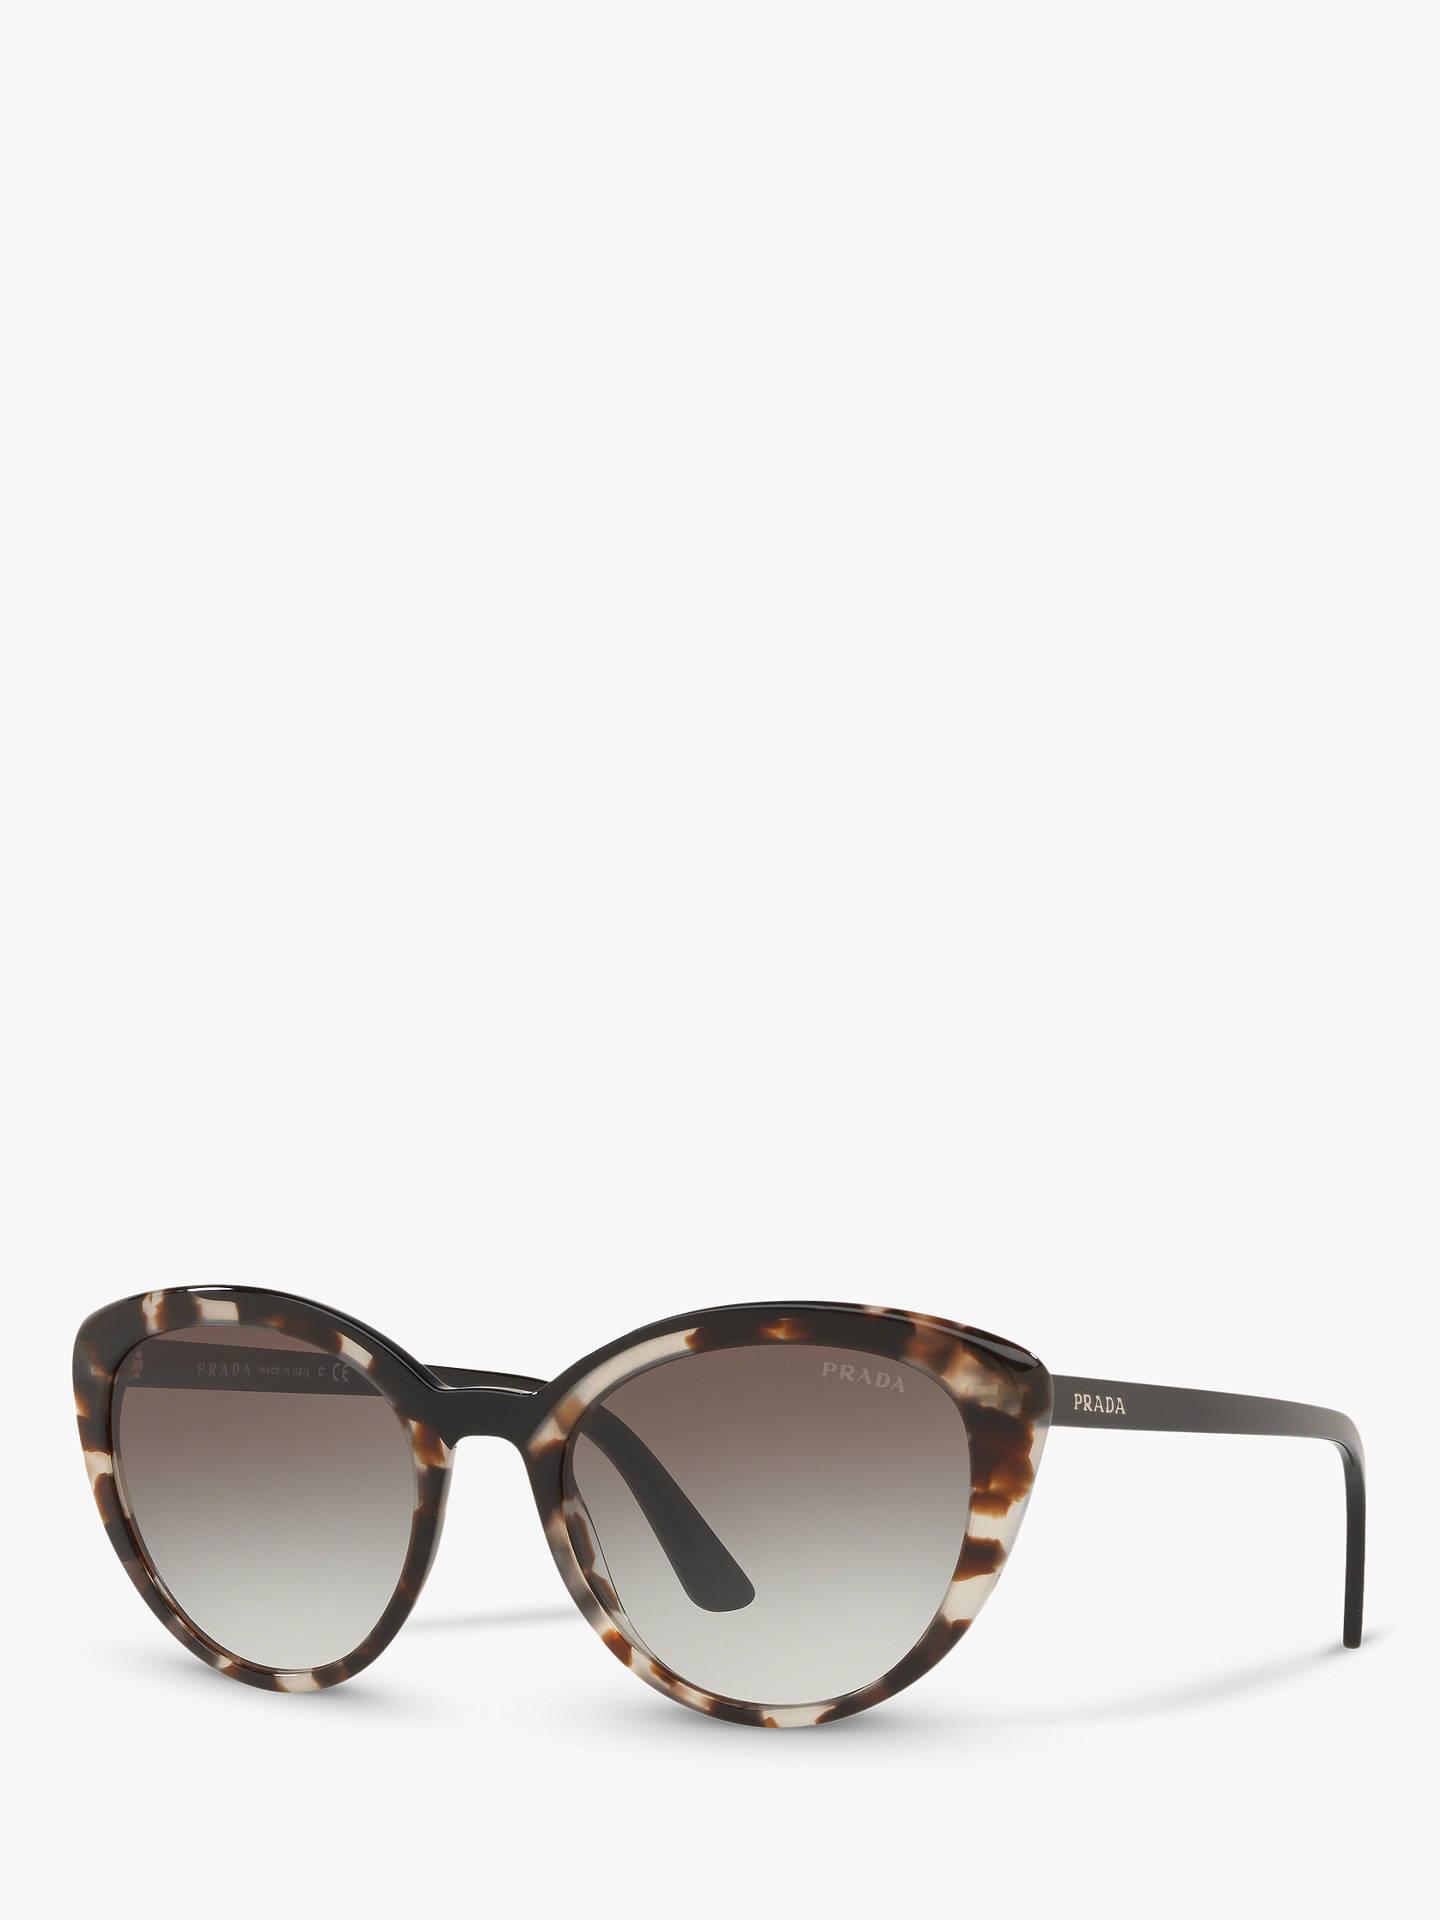 4b87e2c167 Prada PR 02VS Women s Cat s Eye Sunglasses at John Lewis   Partners